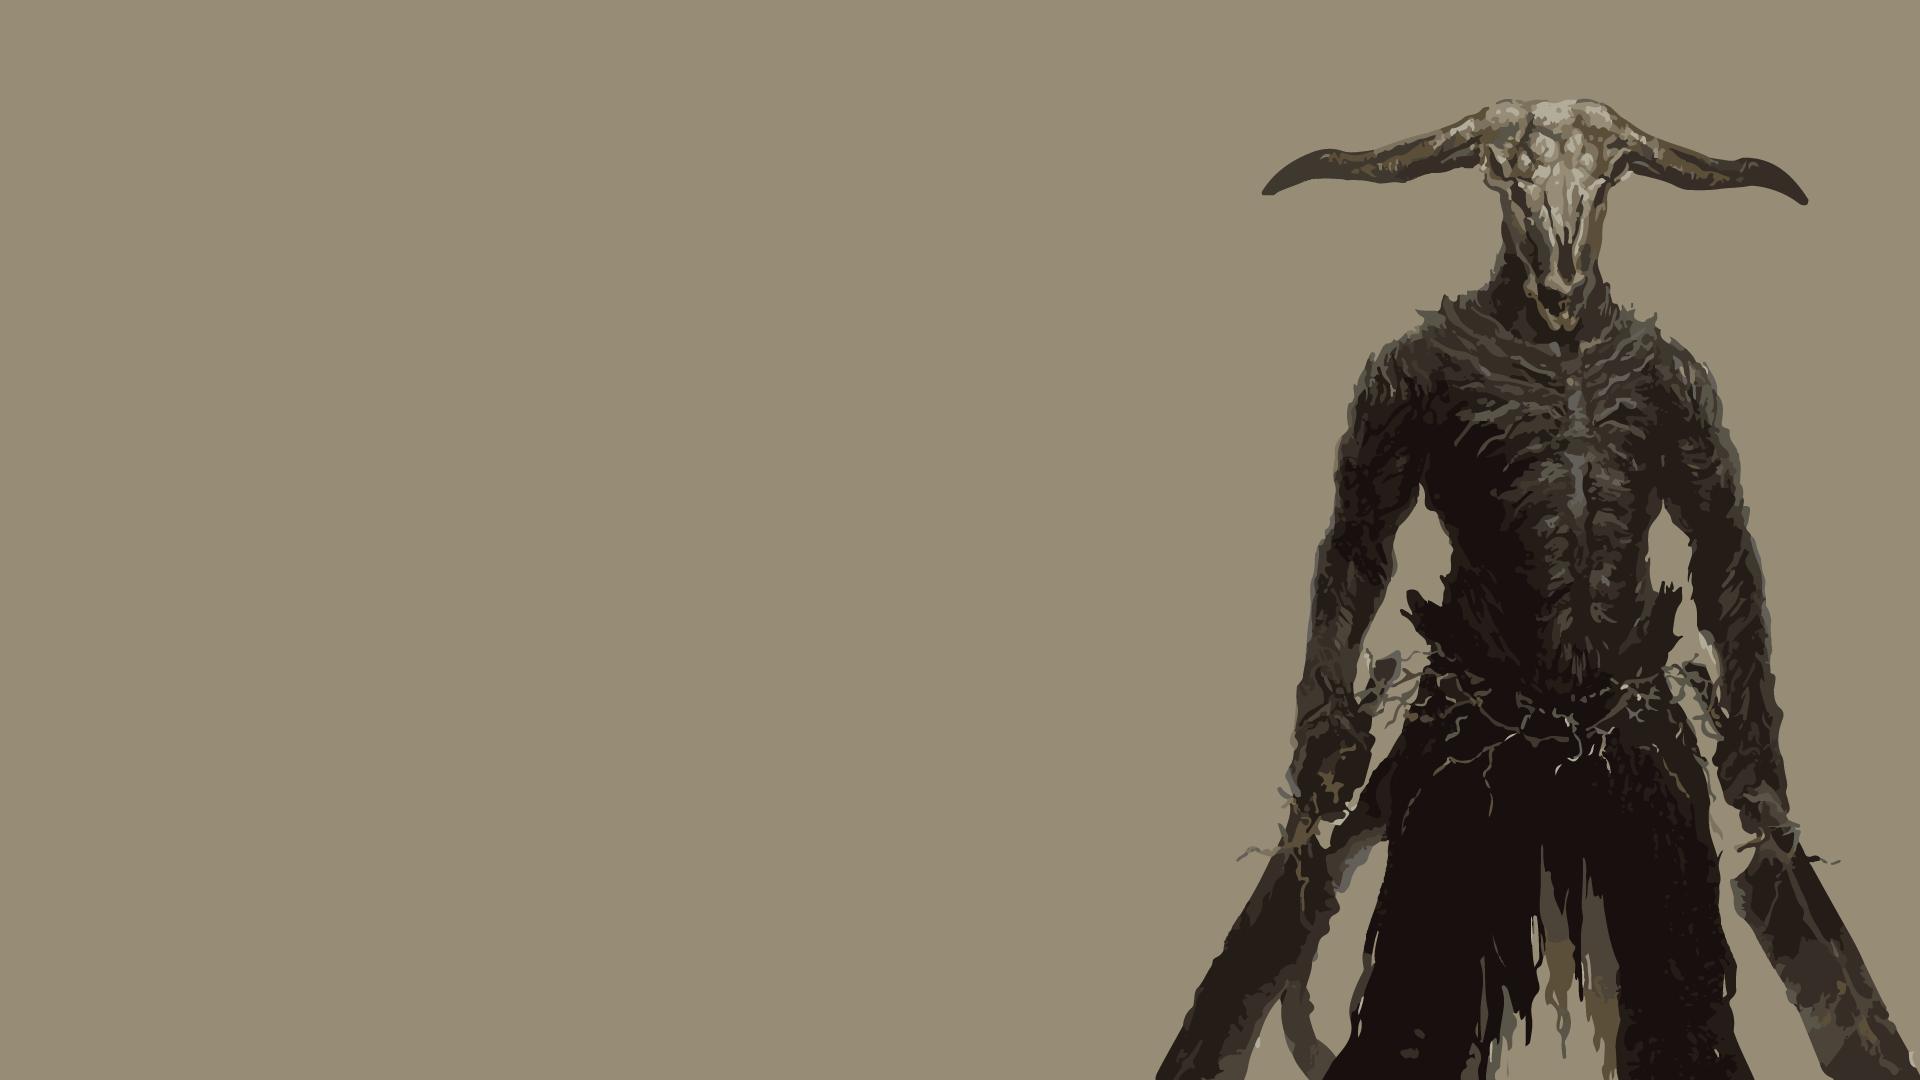 #dark Souls, #fantasy Art, #warrior, #capra Demon, - Dark Souls Capra Demon , HD Wallpaper & Backgrounds